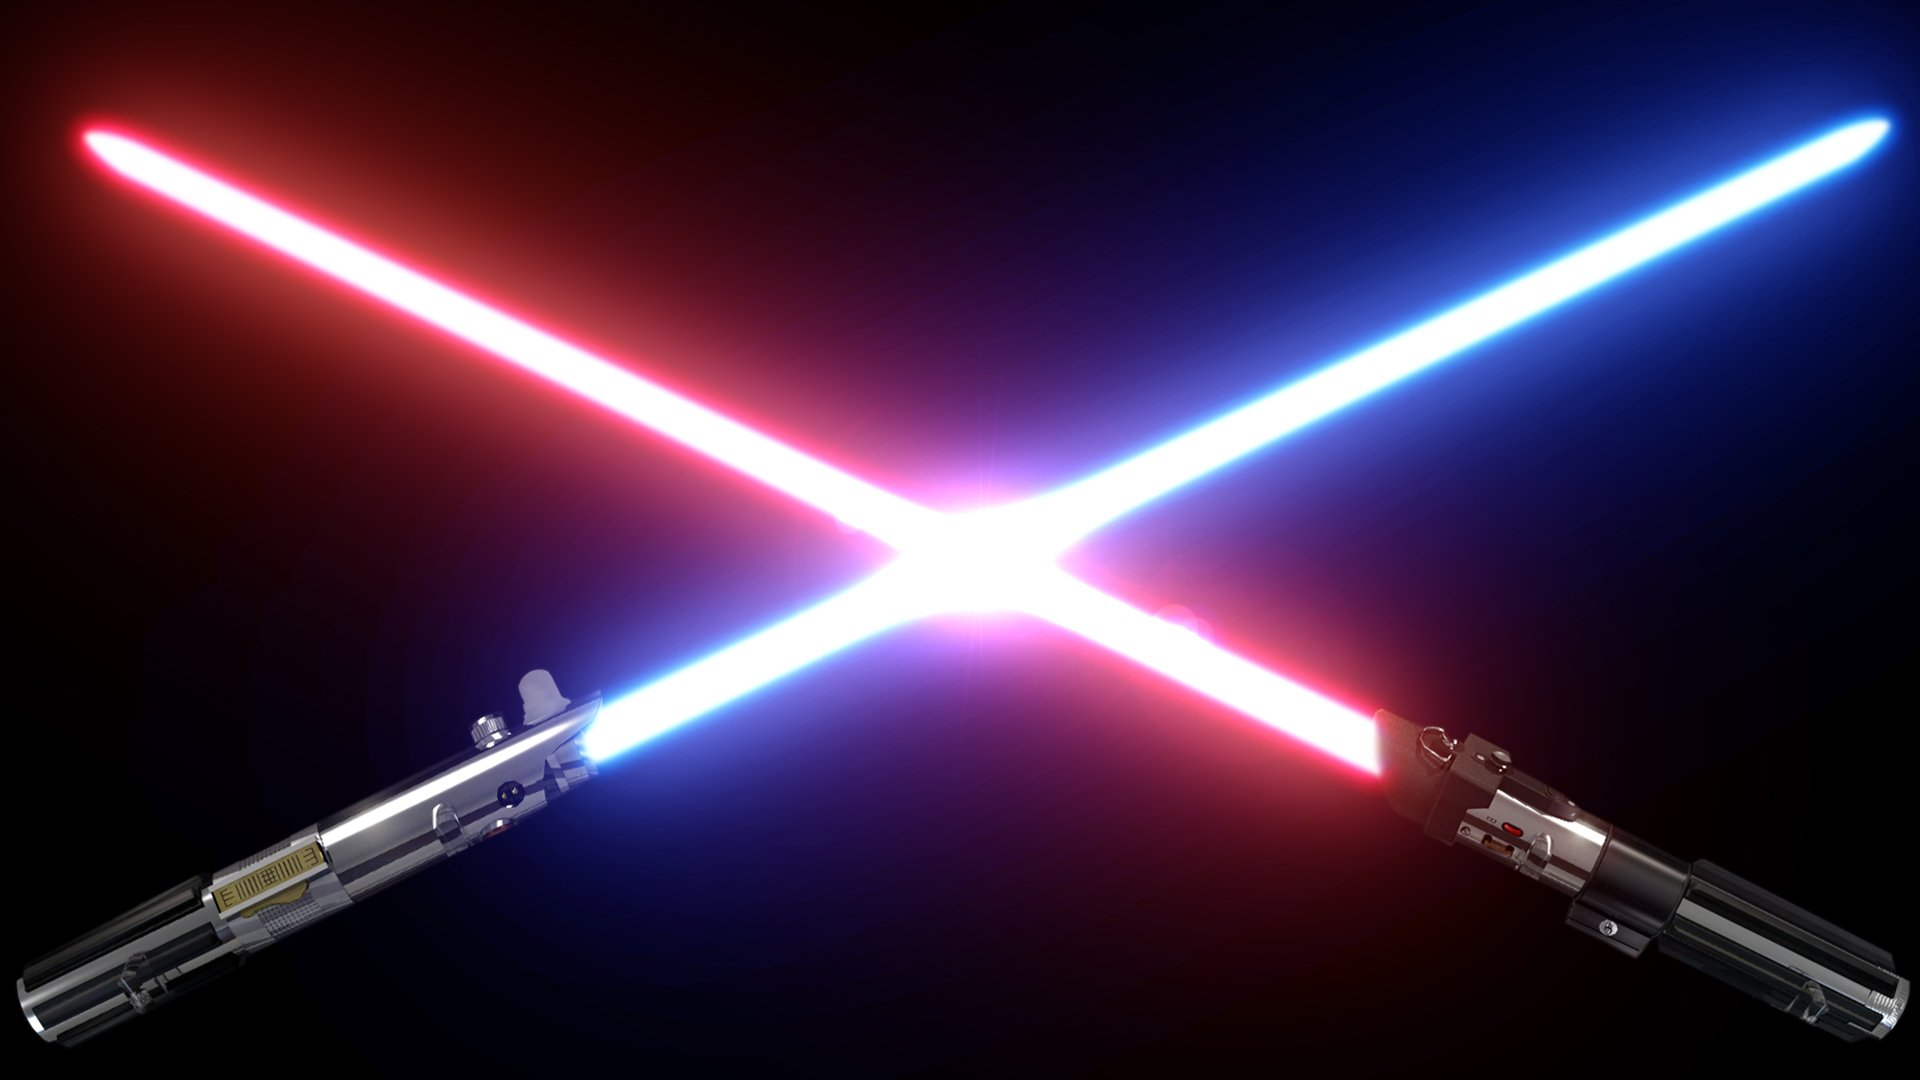 IMAGE(http://churchm.ag/wp-content/uploads/2014/06/lightsabers-clash.jpg)